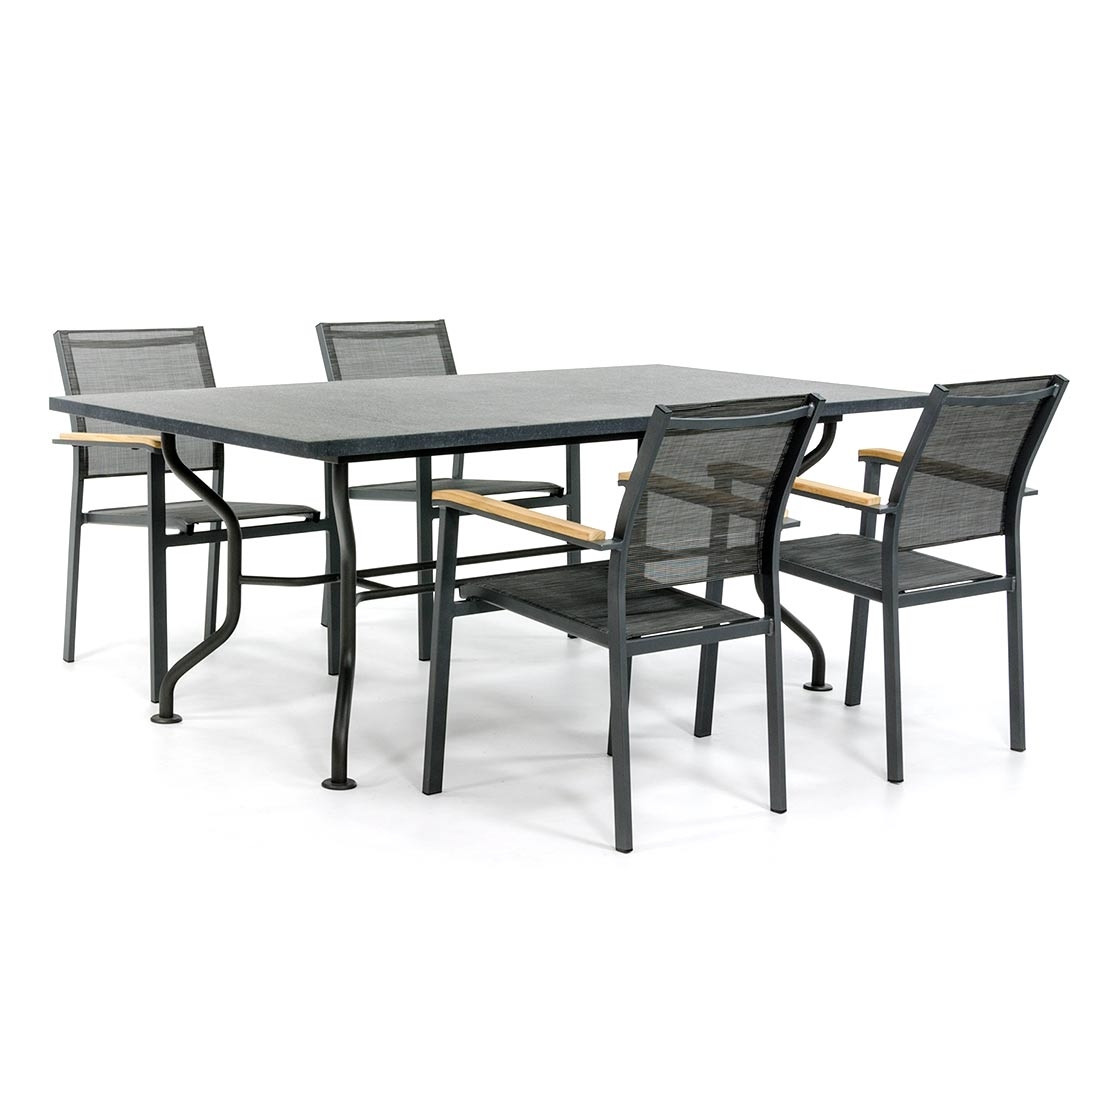 Basalt tuintafel met textilene stoelen